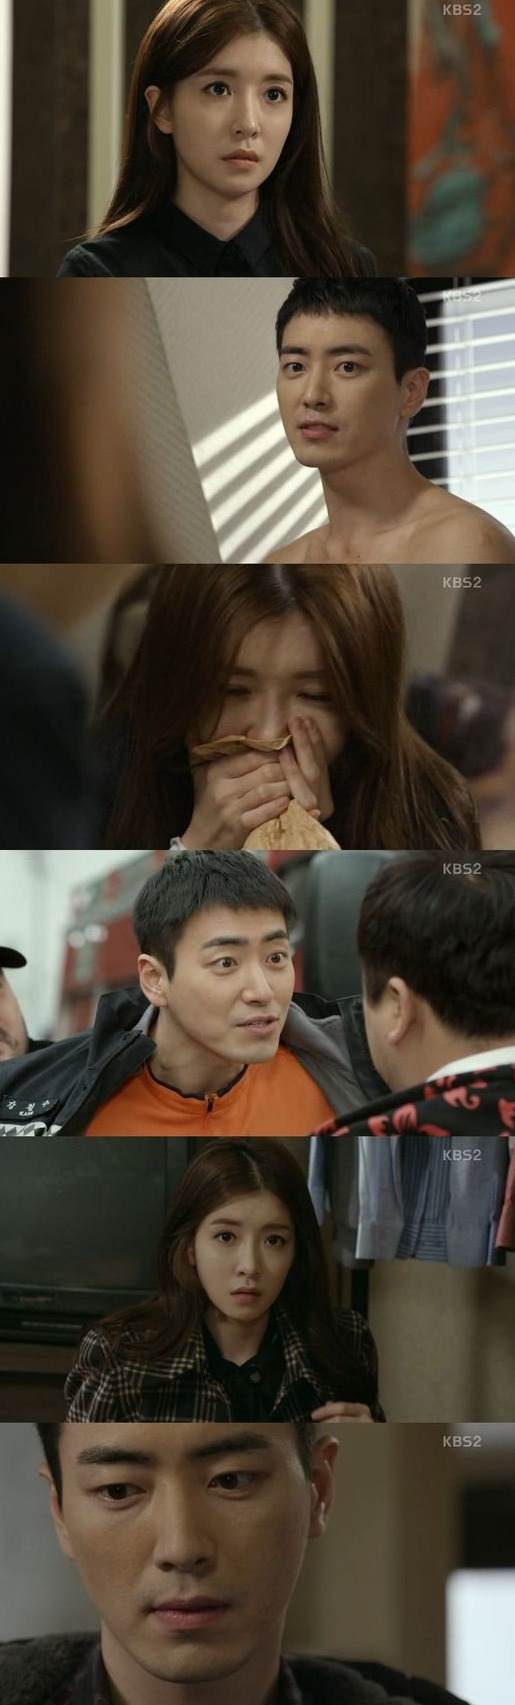 [Spoiler] Added final episode 4 captures for the Korean